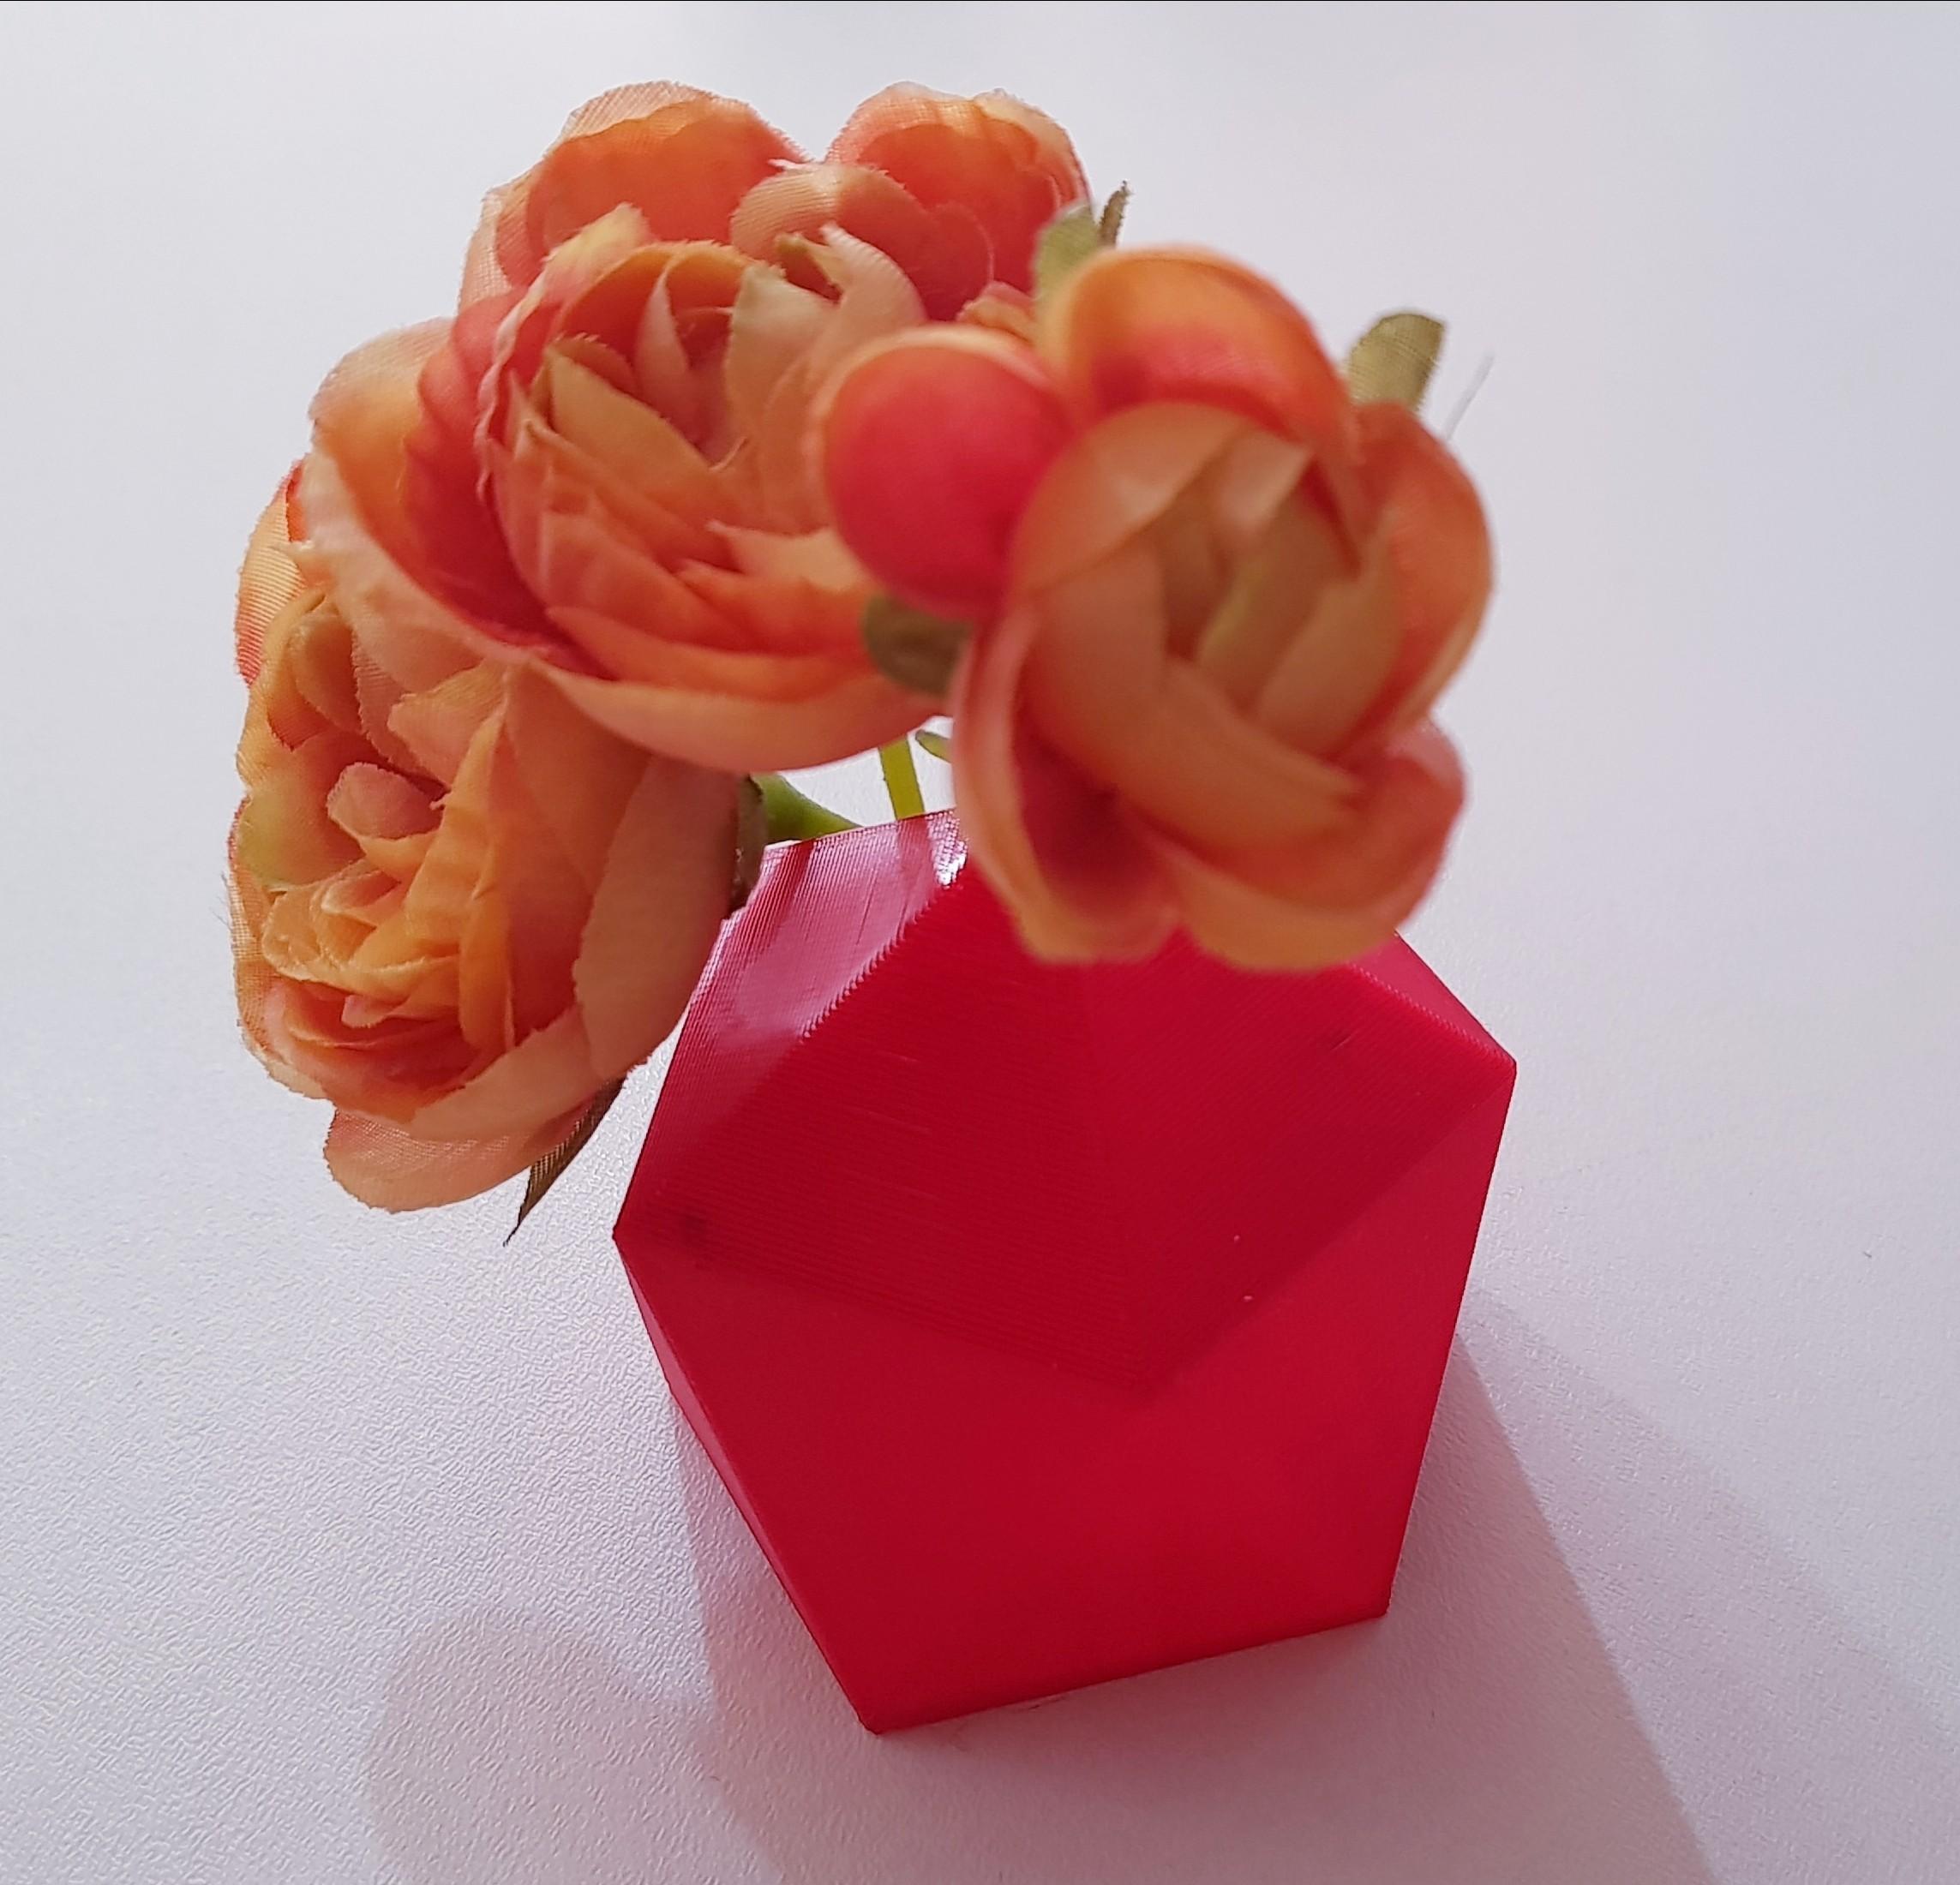 20180219_111906.jpg Download free STL file Mini planter • 3D printing design, solunkejagruti